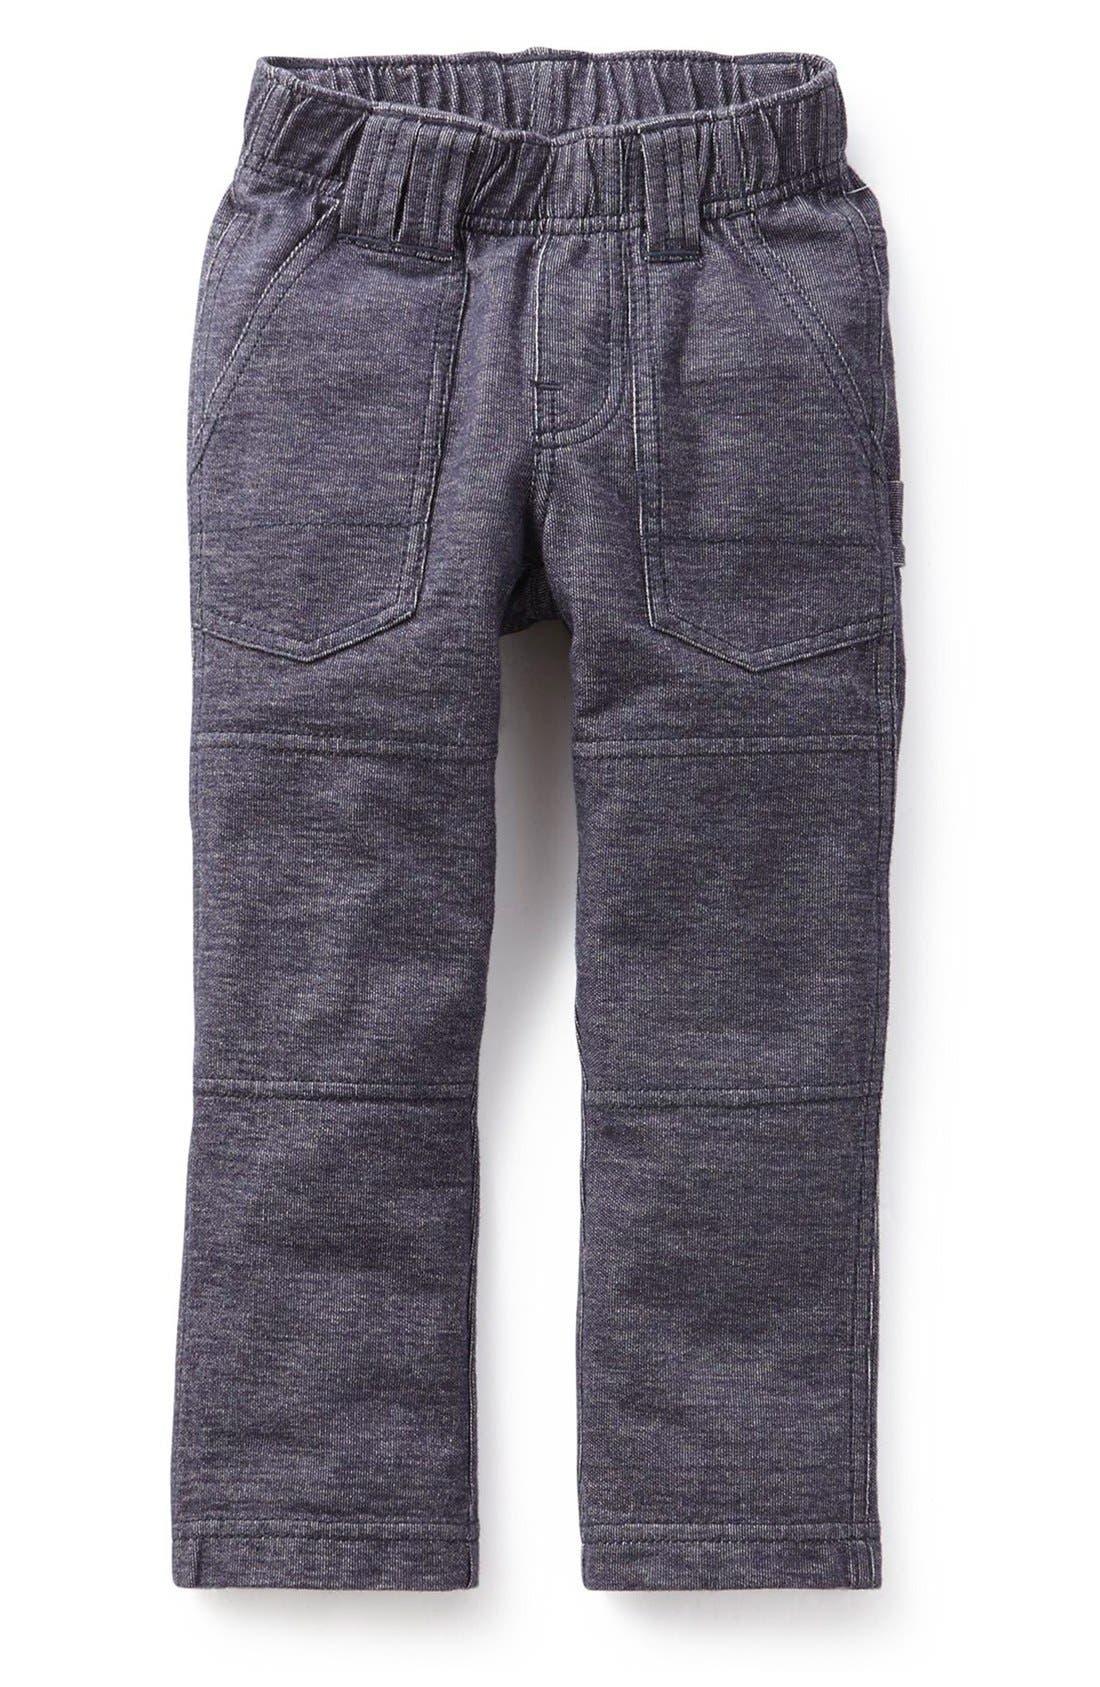 Tea Collection 'Playwear' Pants (Toddler Boys & Little Boys)